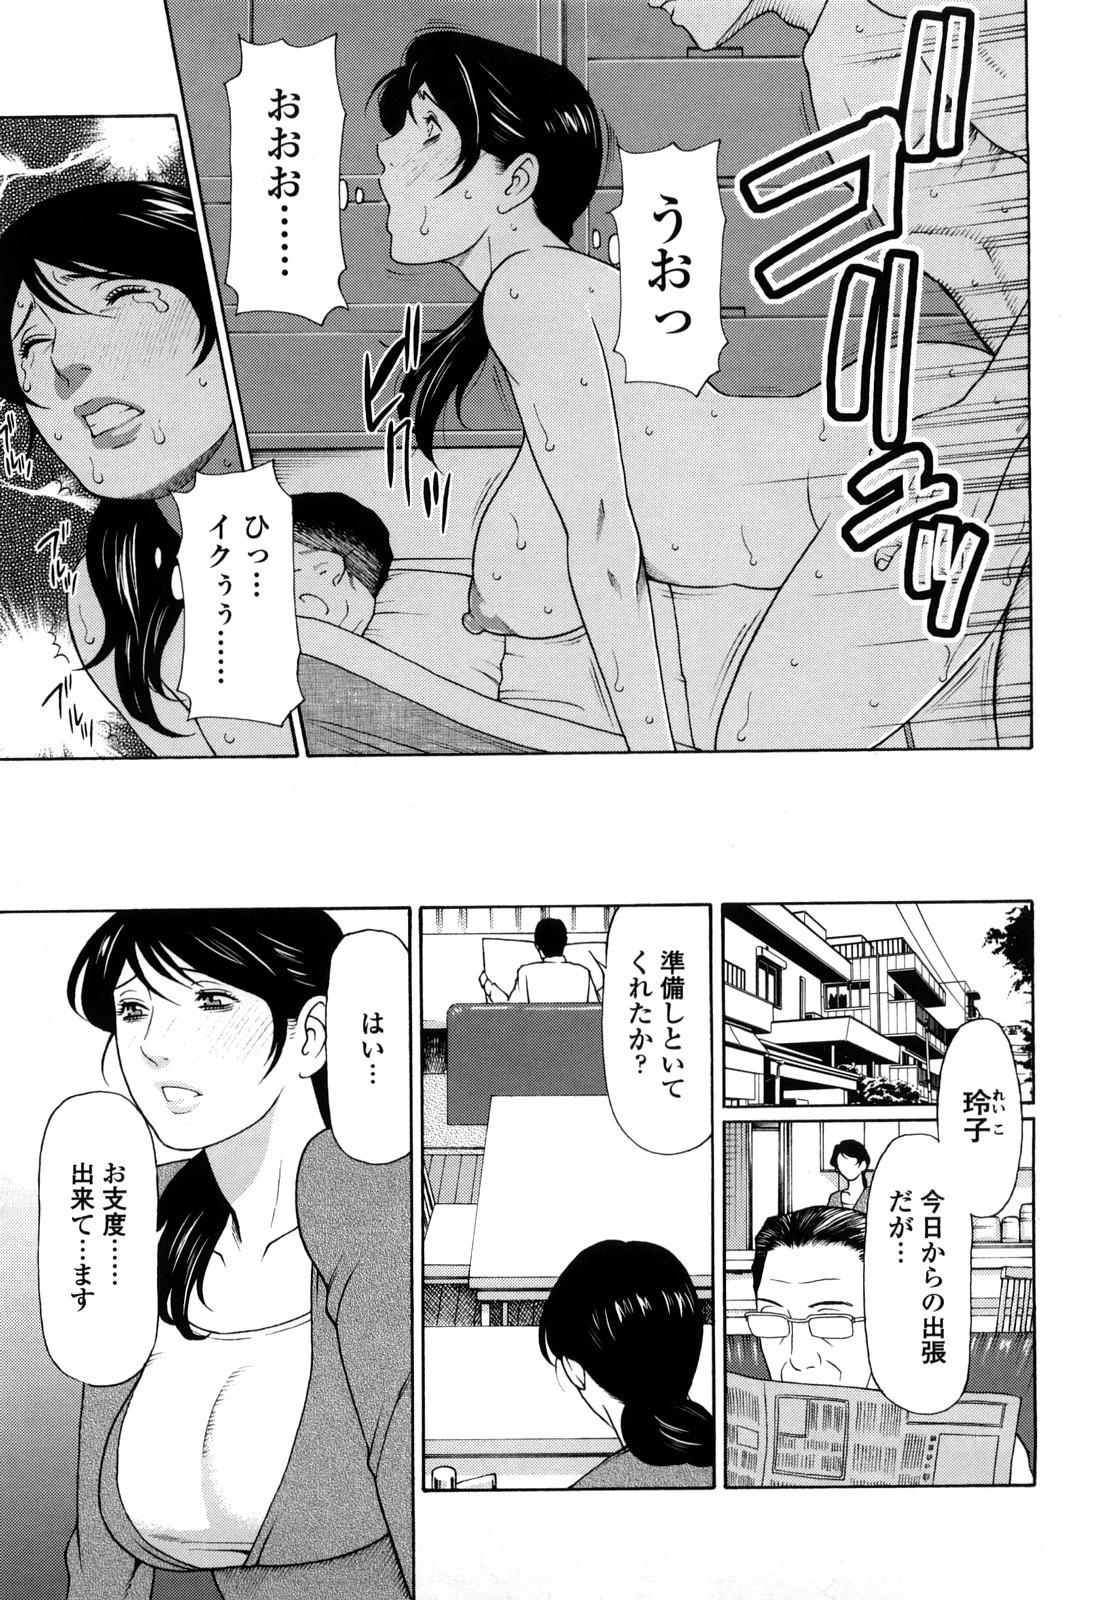 [Takasugi Kou] Kindan no Haha-Ana - Immorality Love-Hole [Decensored] 78